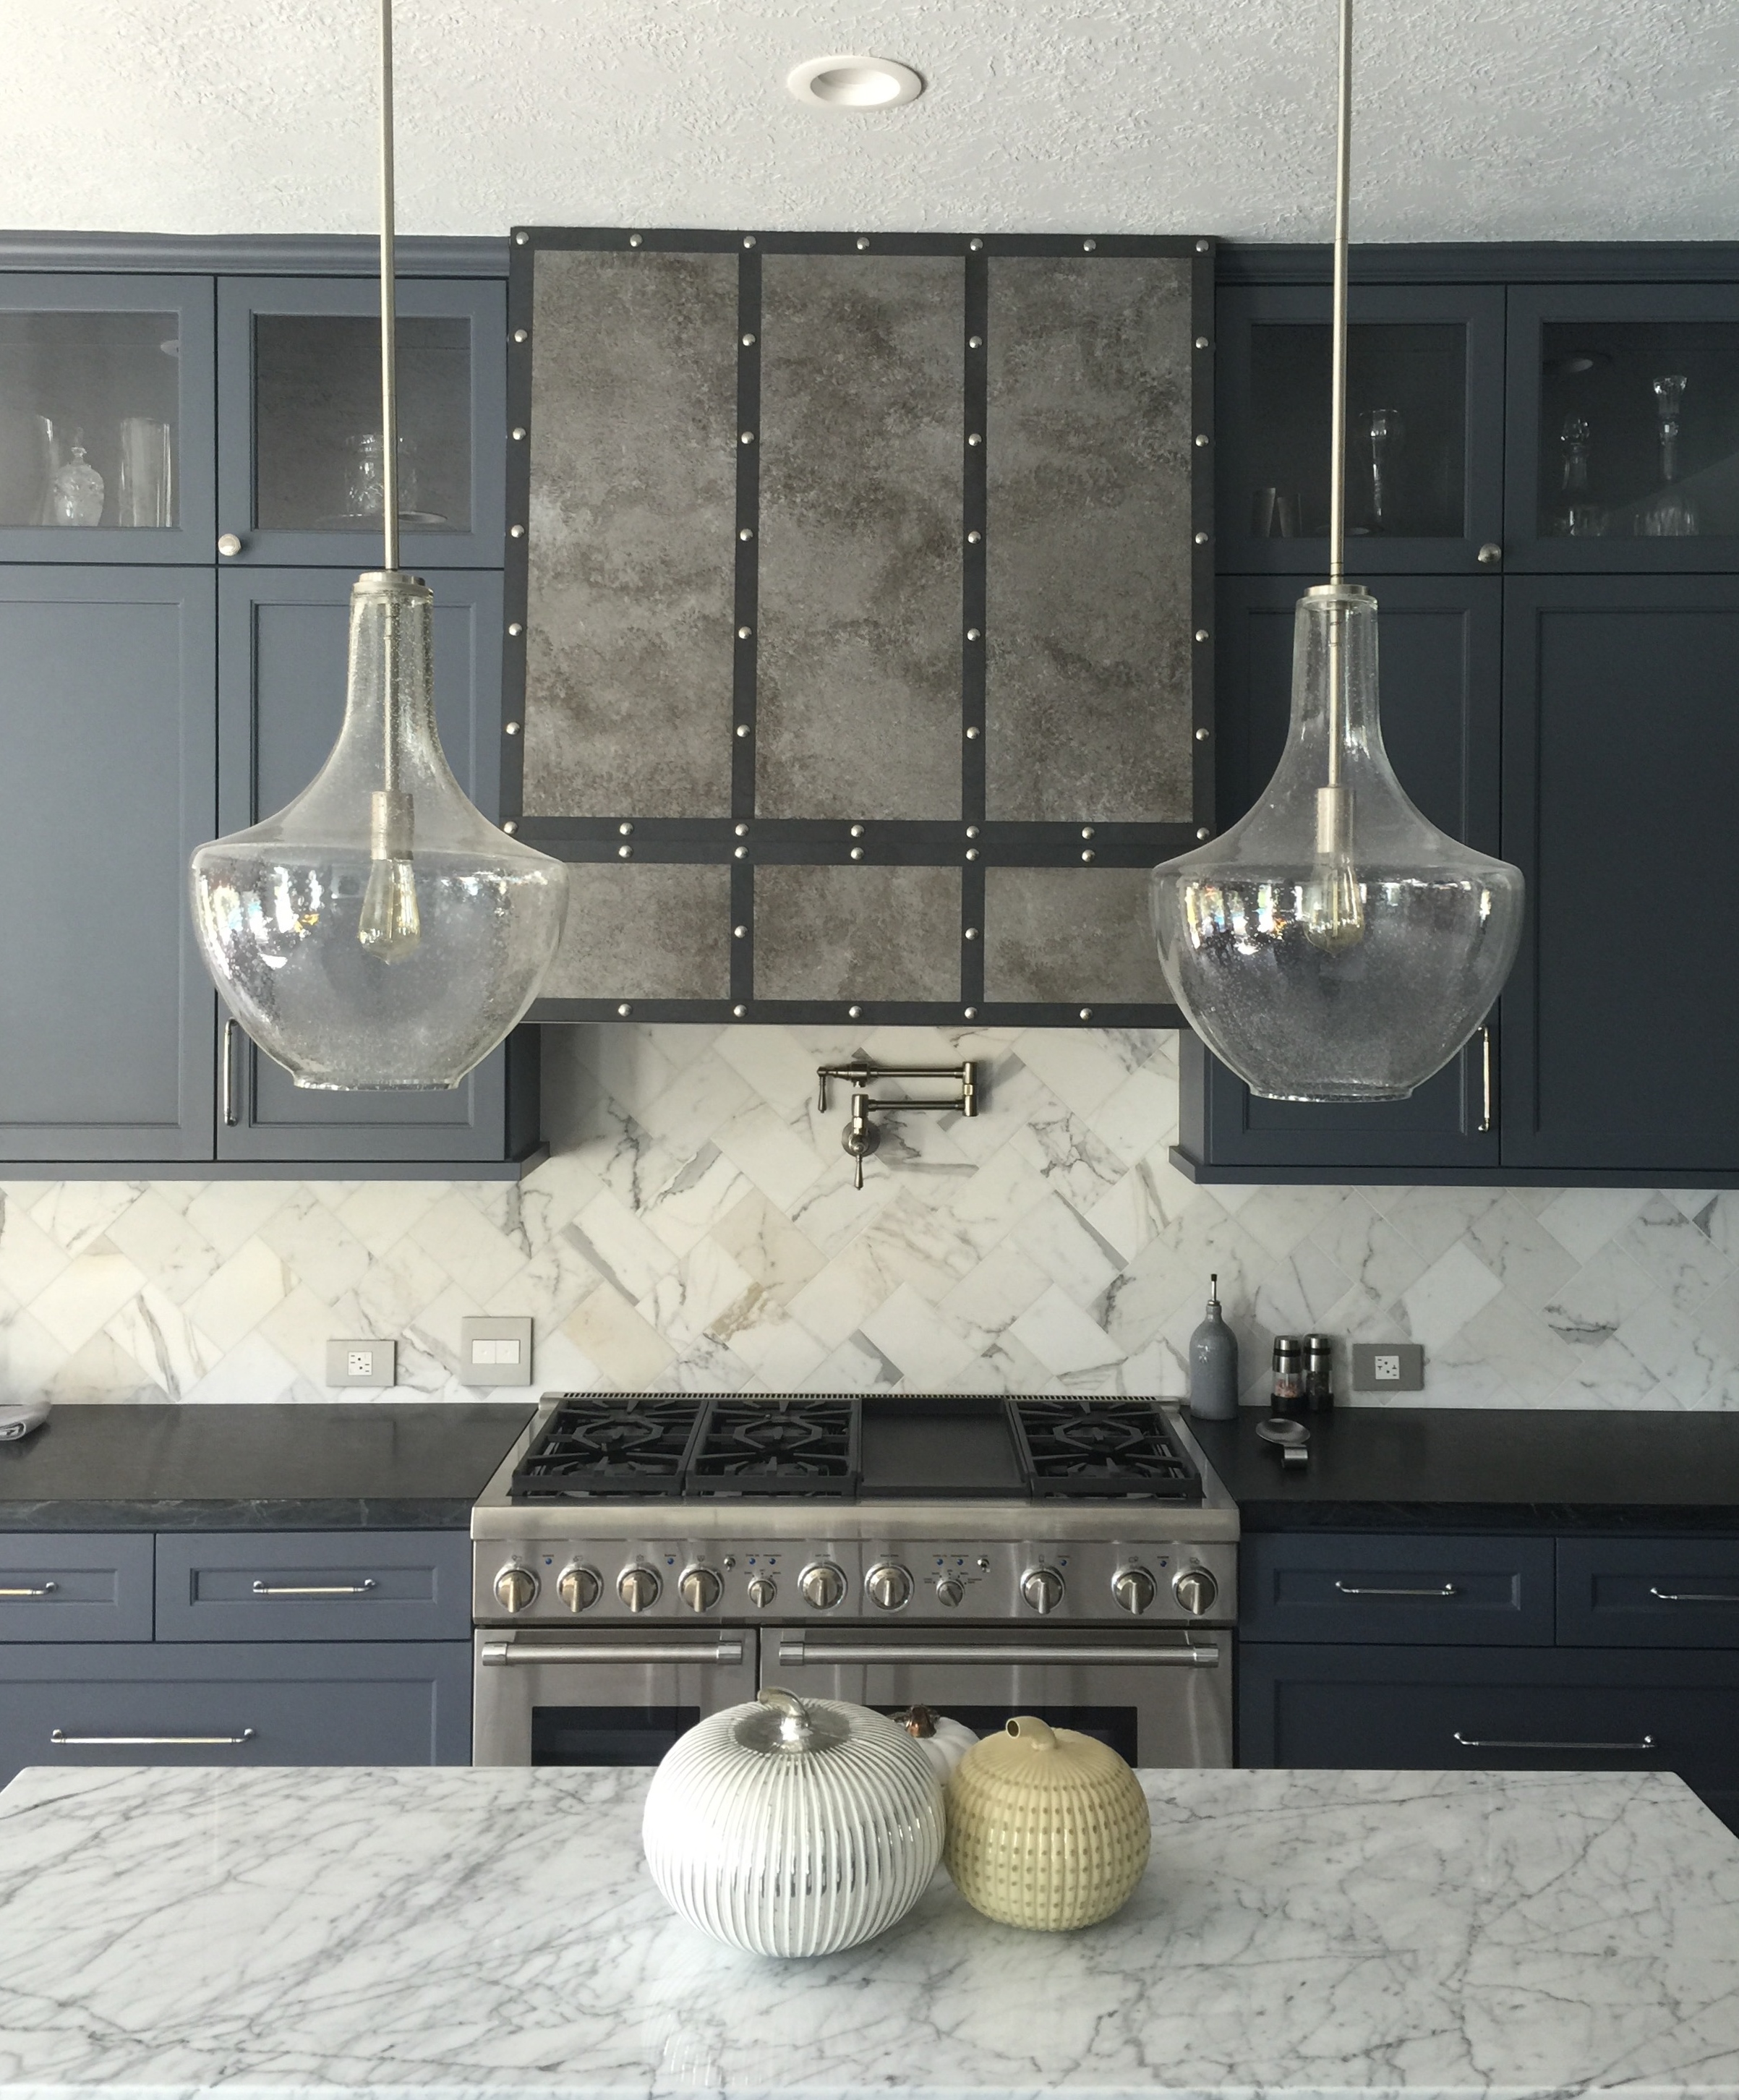 White marble on kitchen island and soapstone counter at perimeter cabinets - Carla Aston Designer